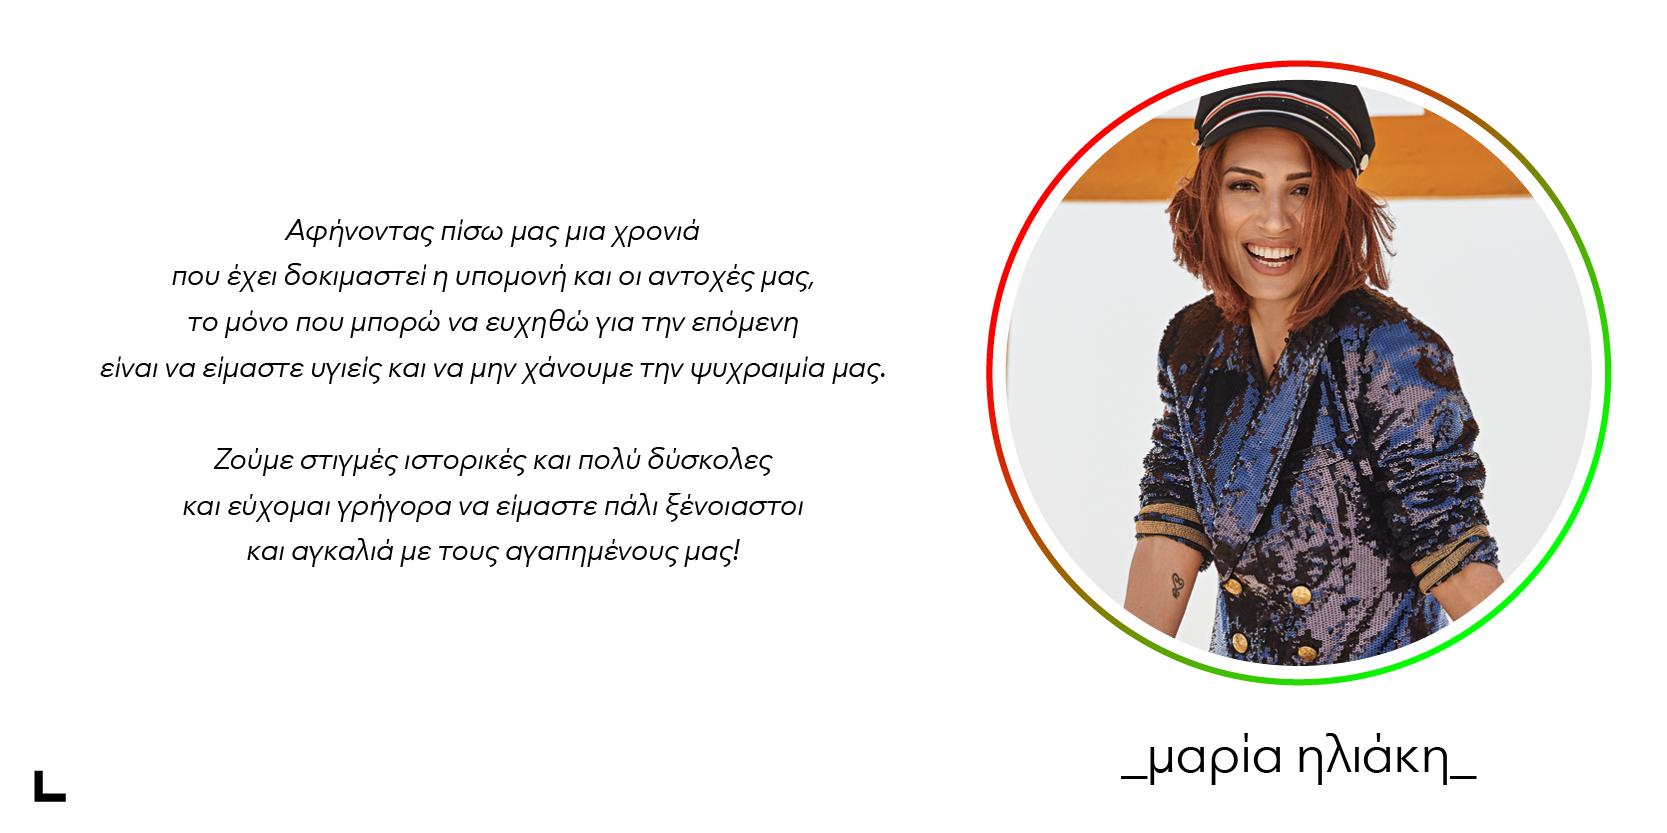 maria_iliaki